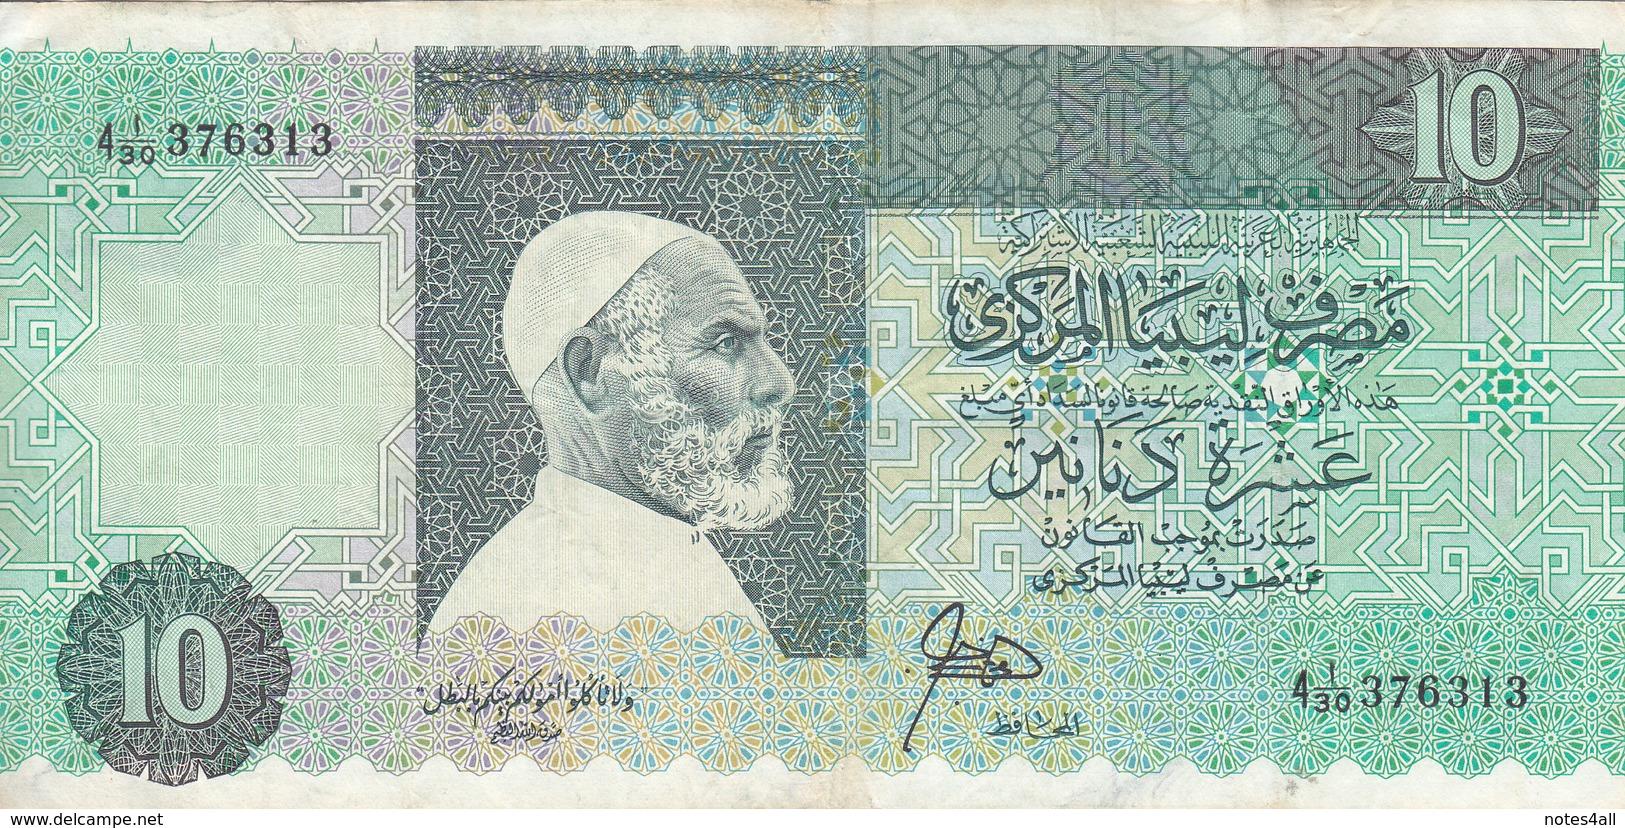 LIBYA 10 DINARS 1989 1990 P-56 SIG/3 RAJAB  PREFIX 30  VF */* - Libye